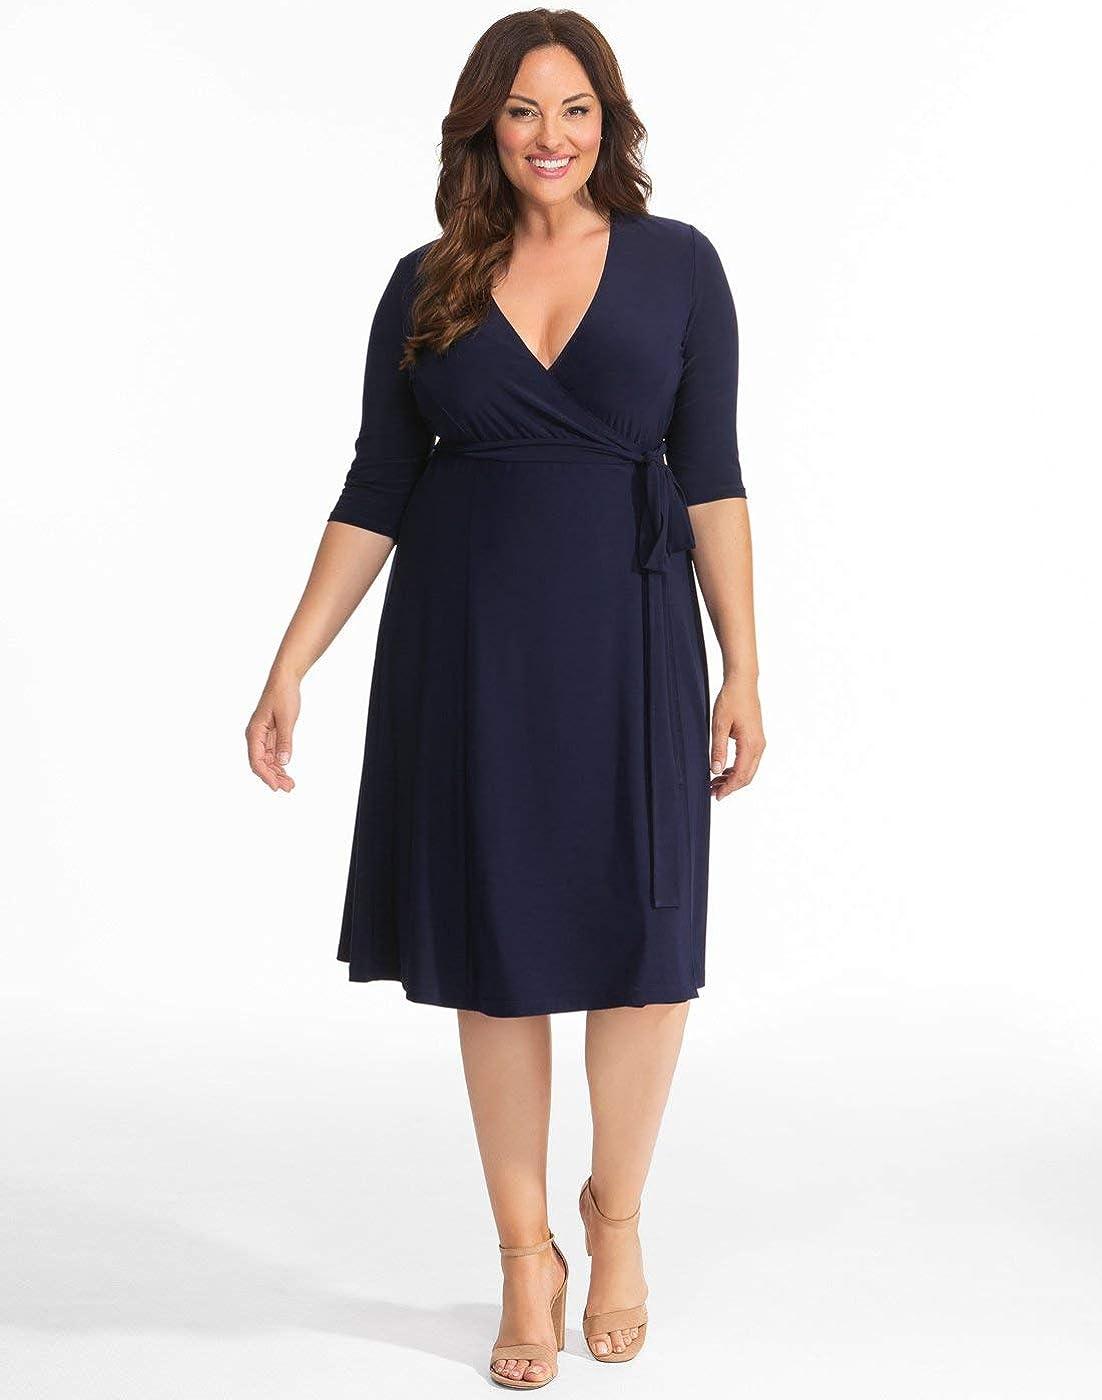 Kiyonna Holiday Special Plus Size Women's Essential Wrap Dress Nouveau Navy